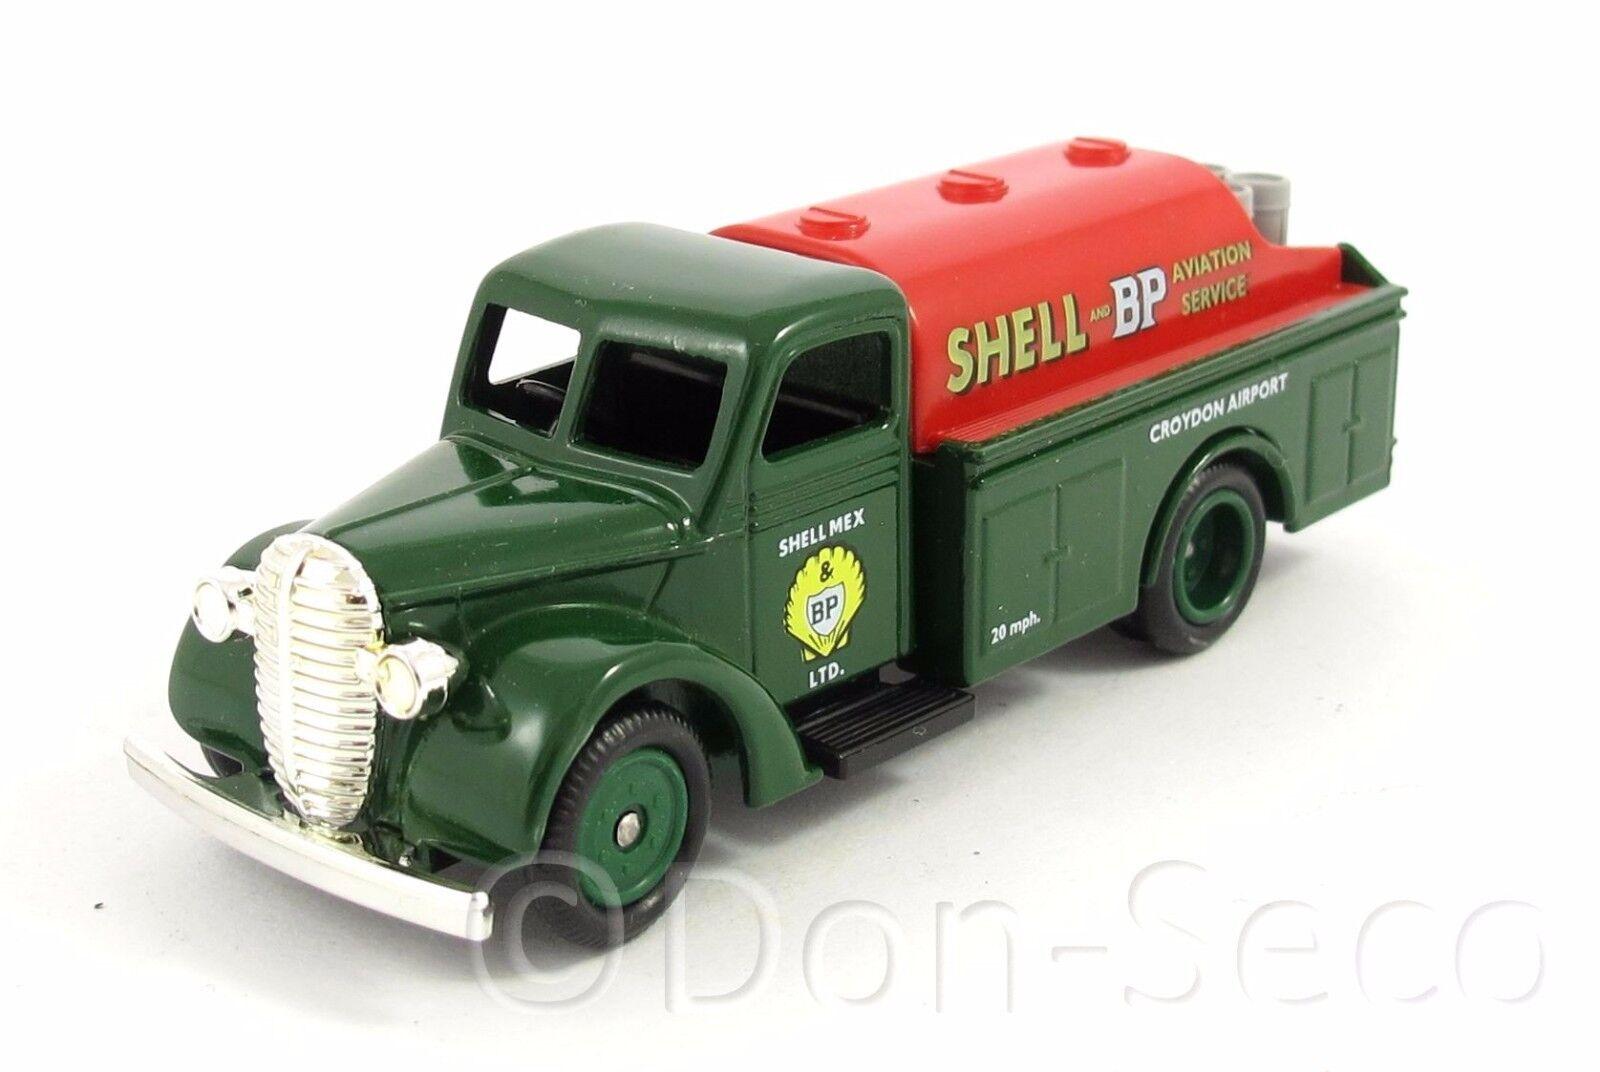 Lledo Days - Gone - 1939 Ford Tanker Shell-BP Aviation - Box - TOP